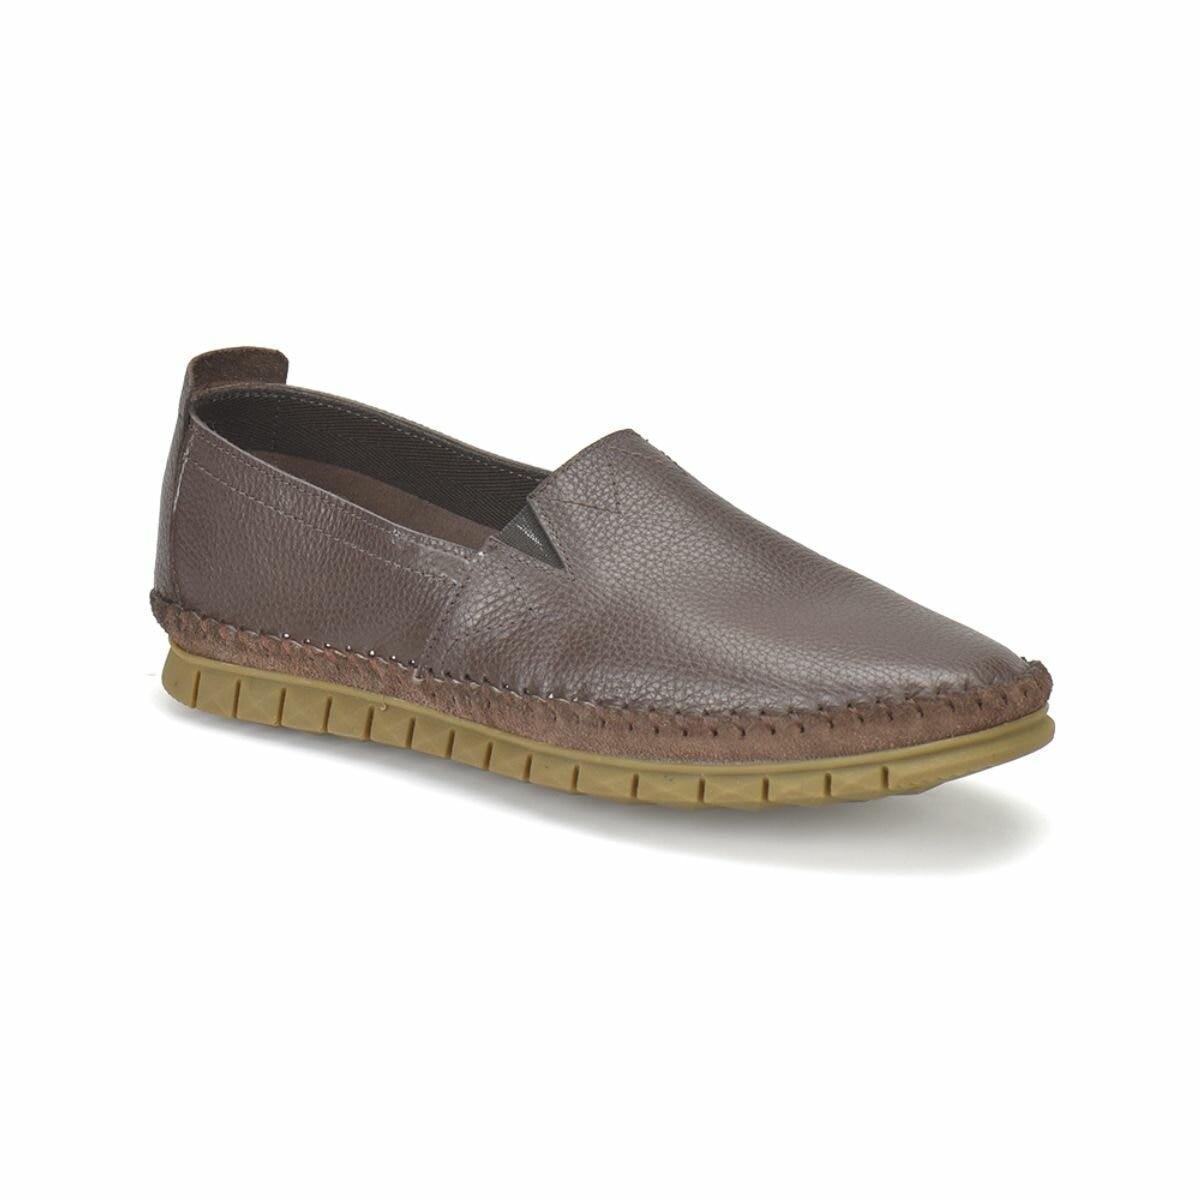 FLO 1055 M 6674 Brown Men 'S Modern Shoes Flogart